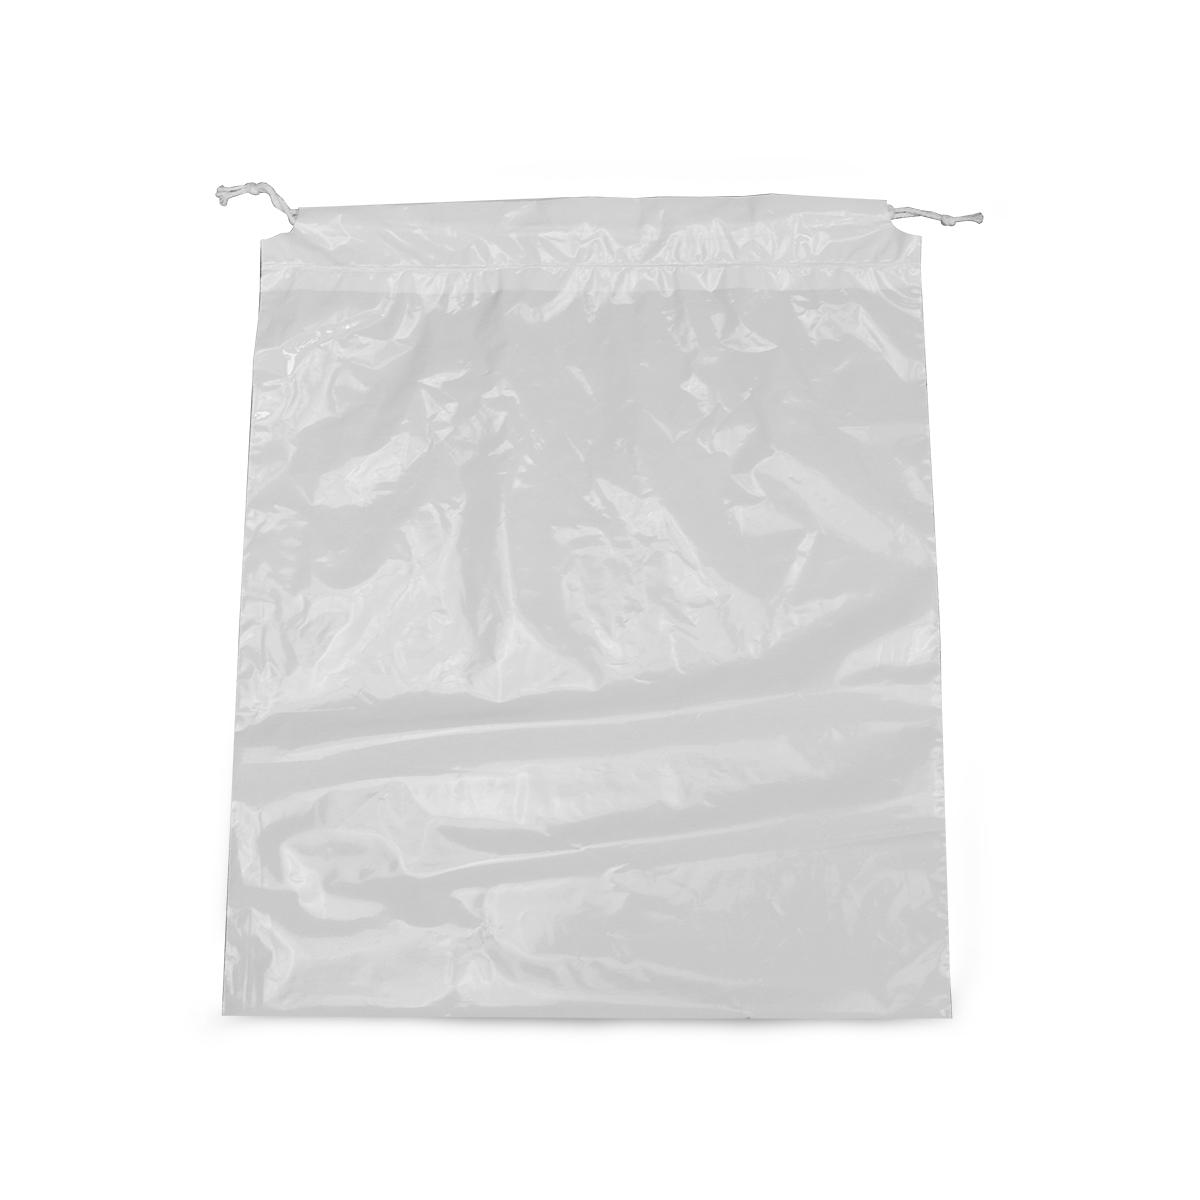 Plastic laundry bags met trekkoord